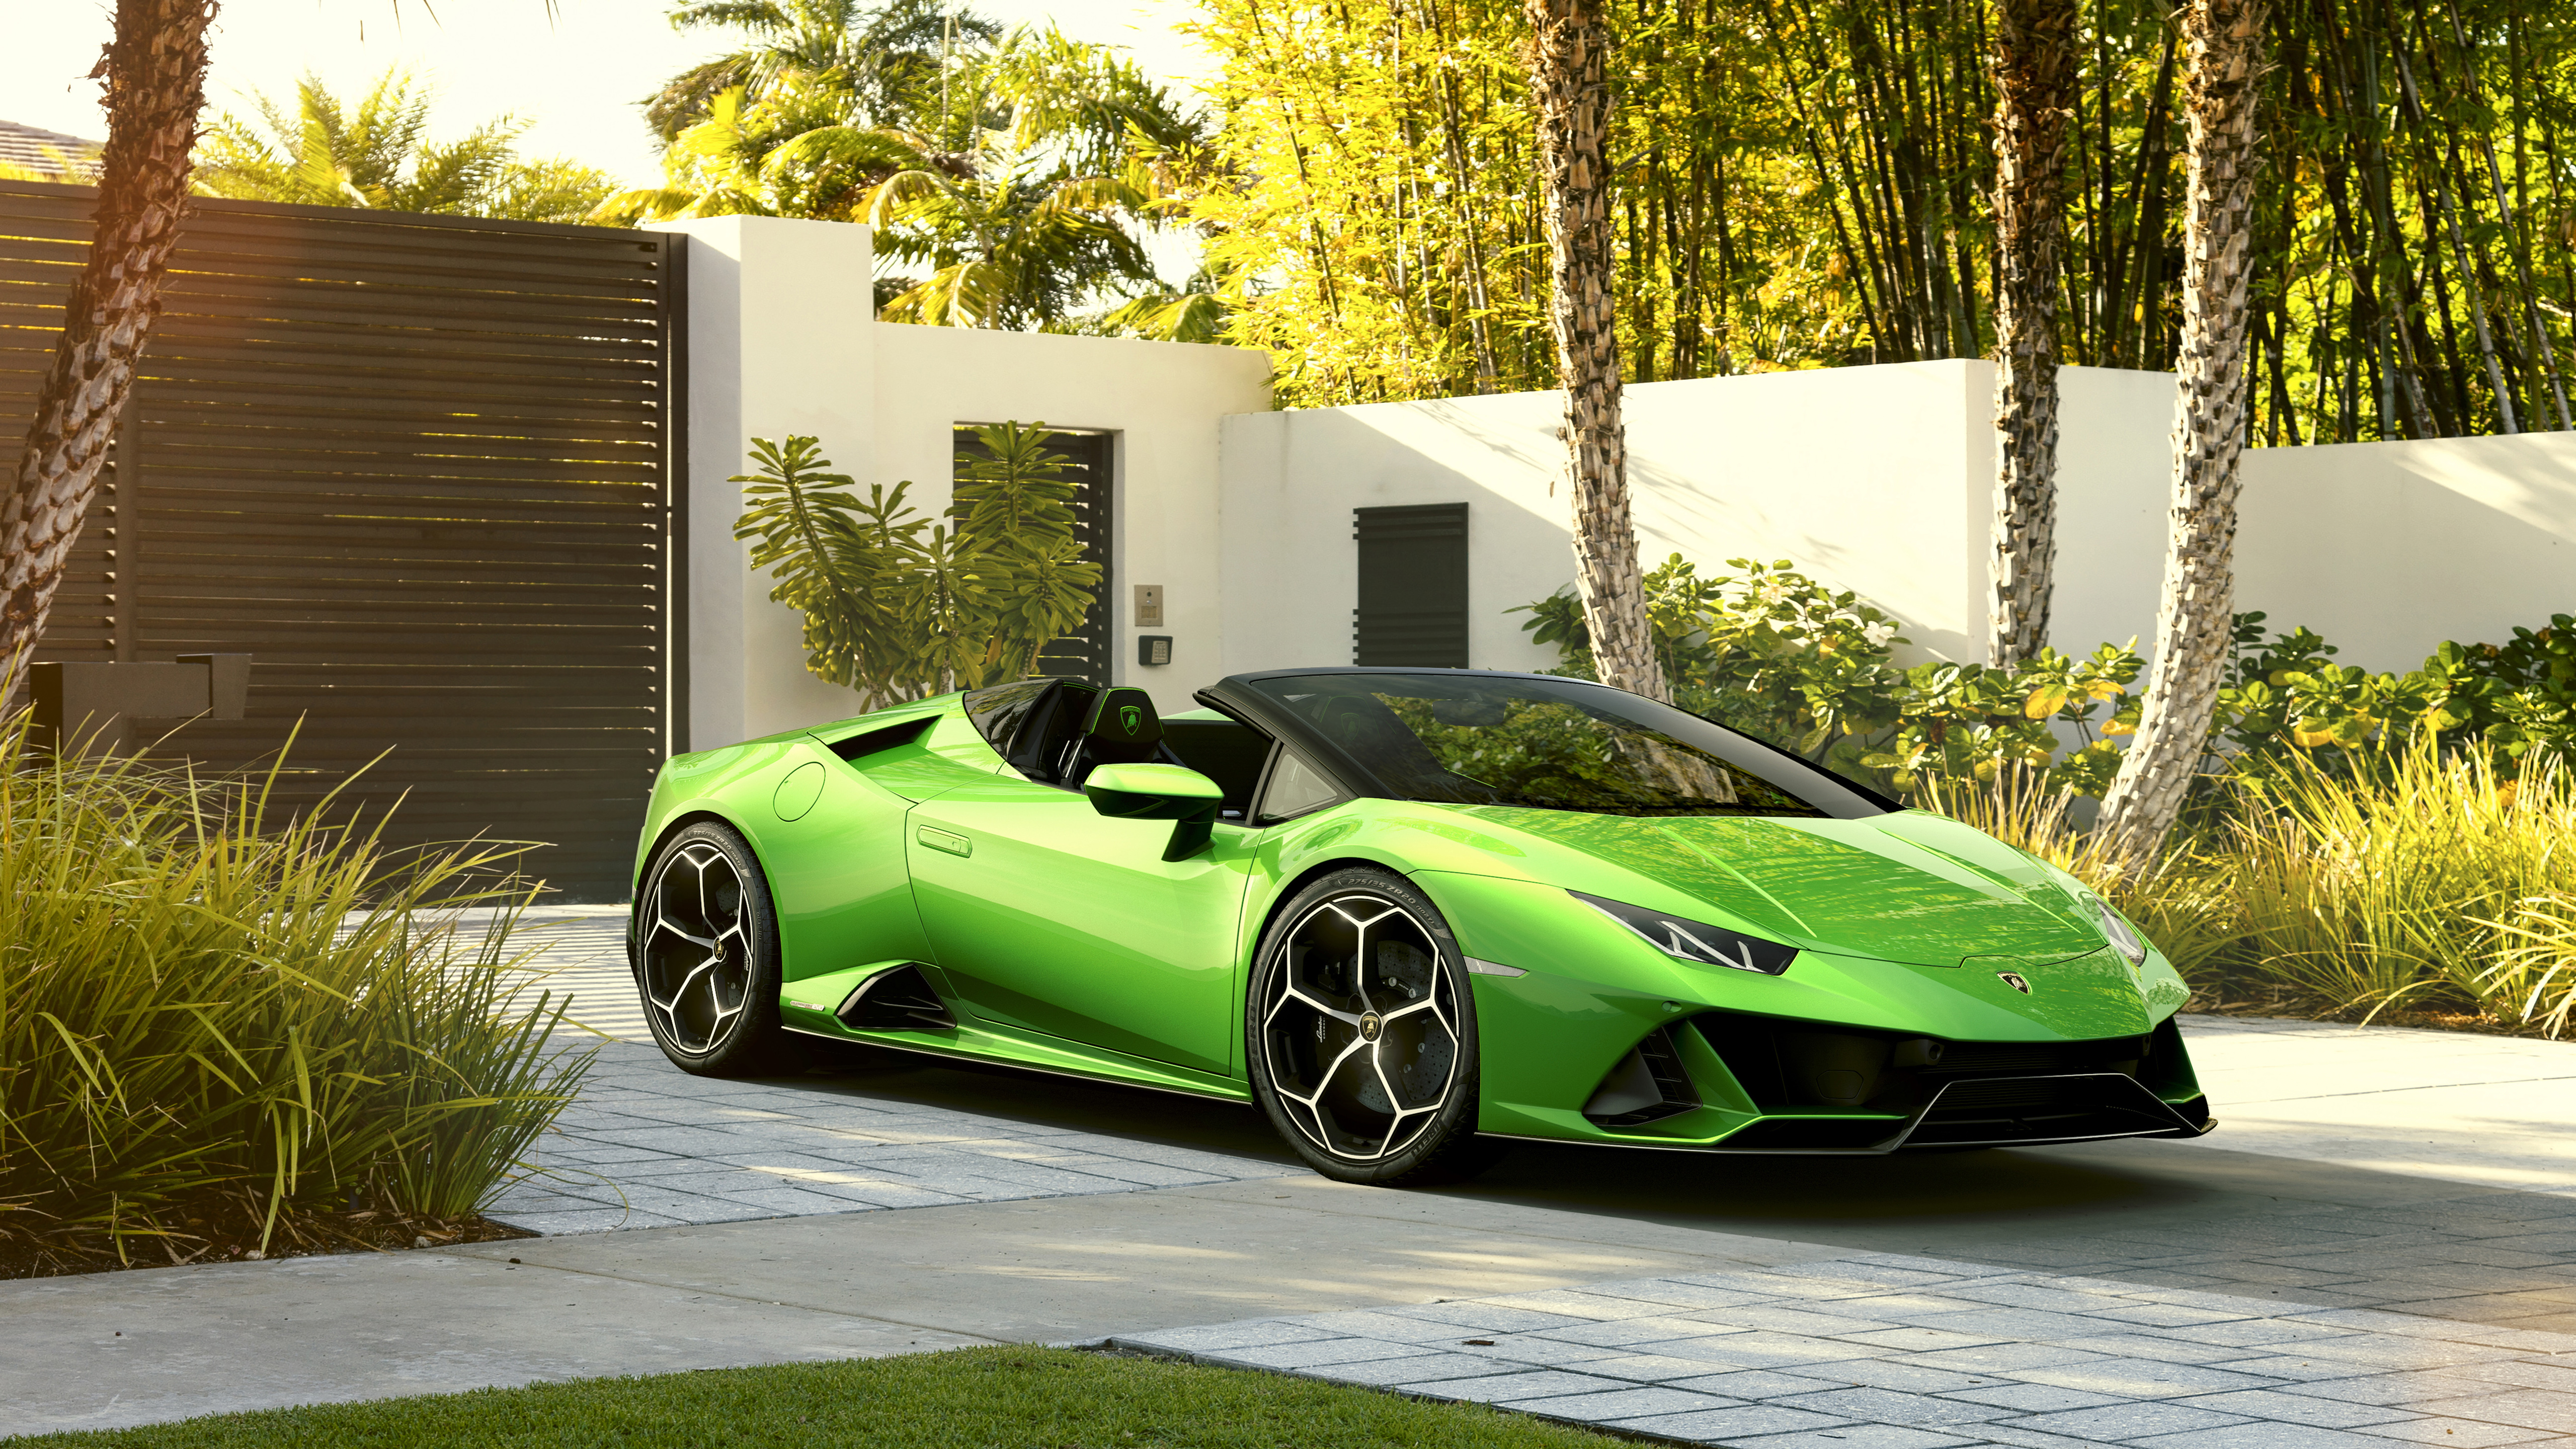 Lamborghini Huracan Evo Spyder 2019 5k 10 Wallpaper Hd Car